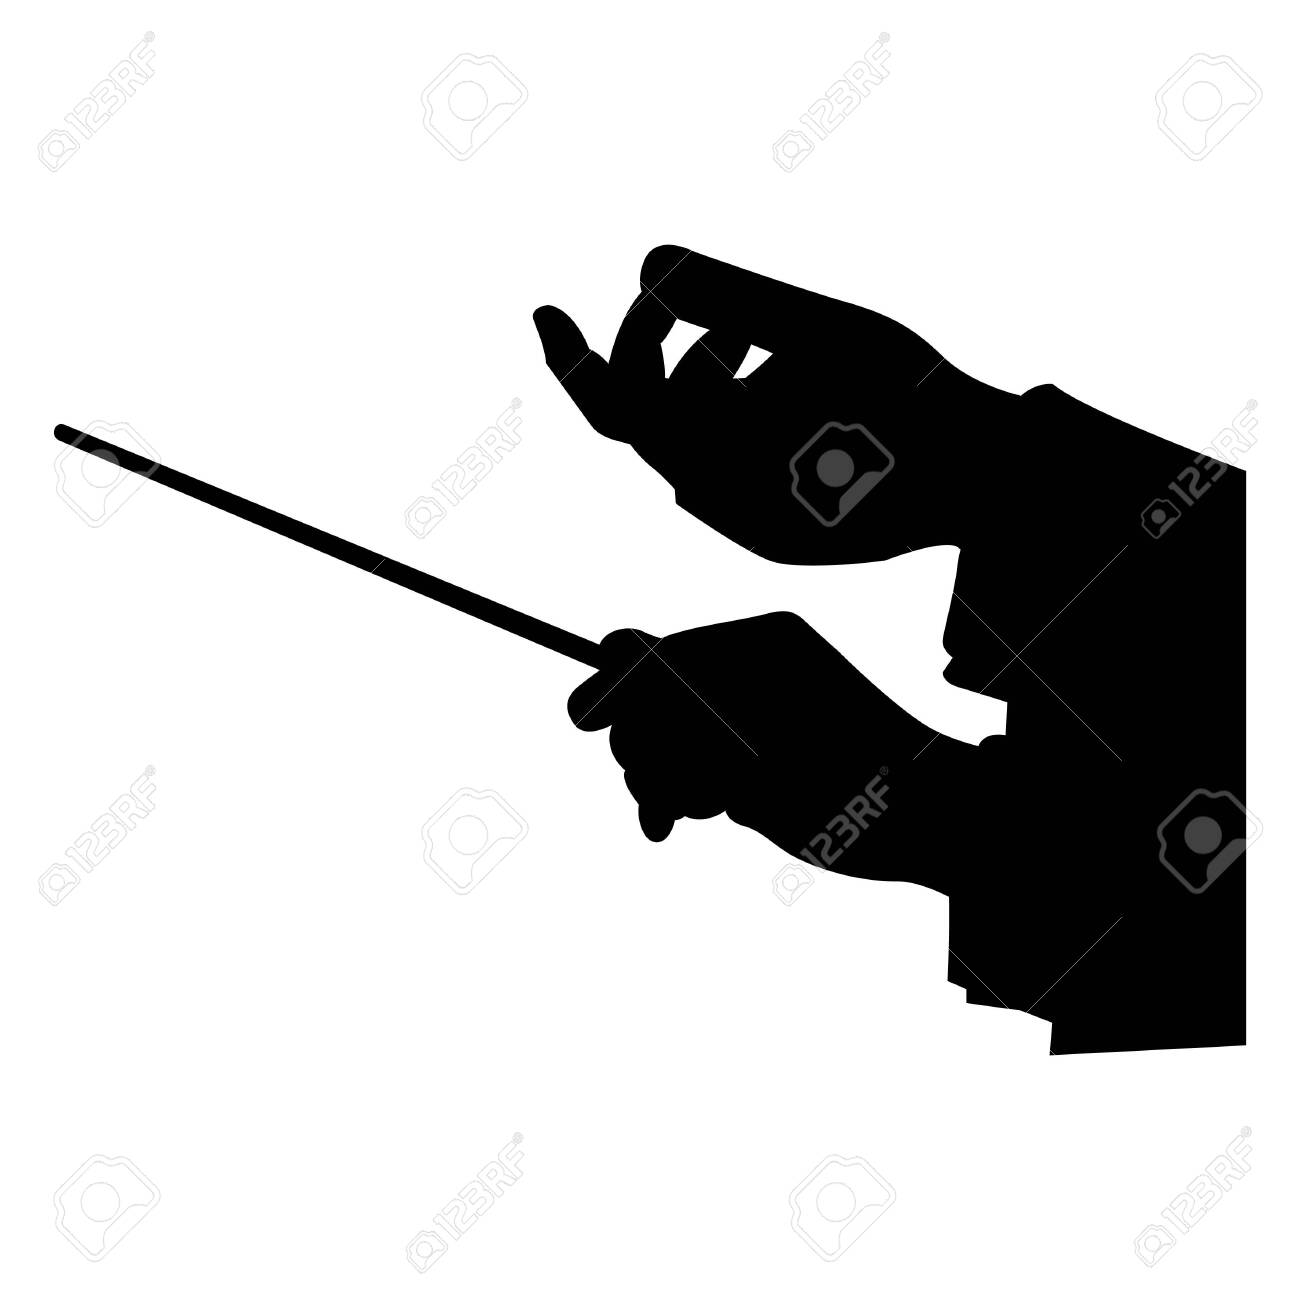 choir guide music, vector illustration - 127476853